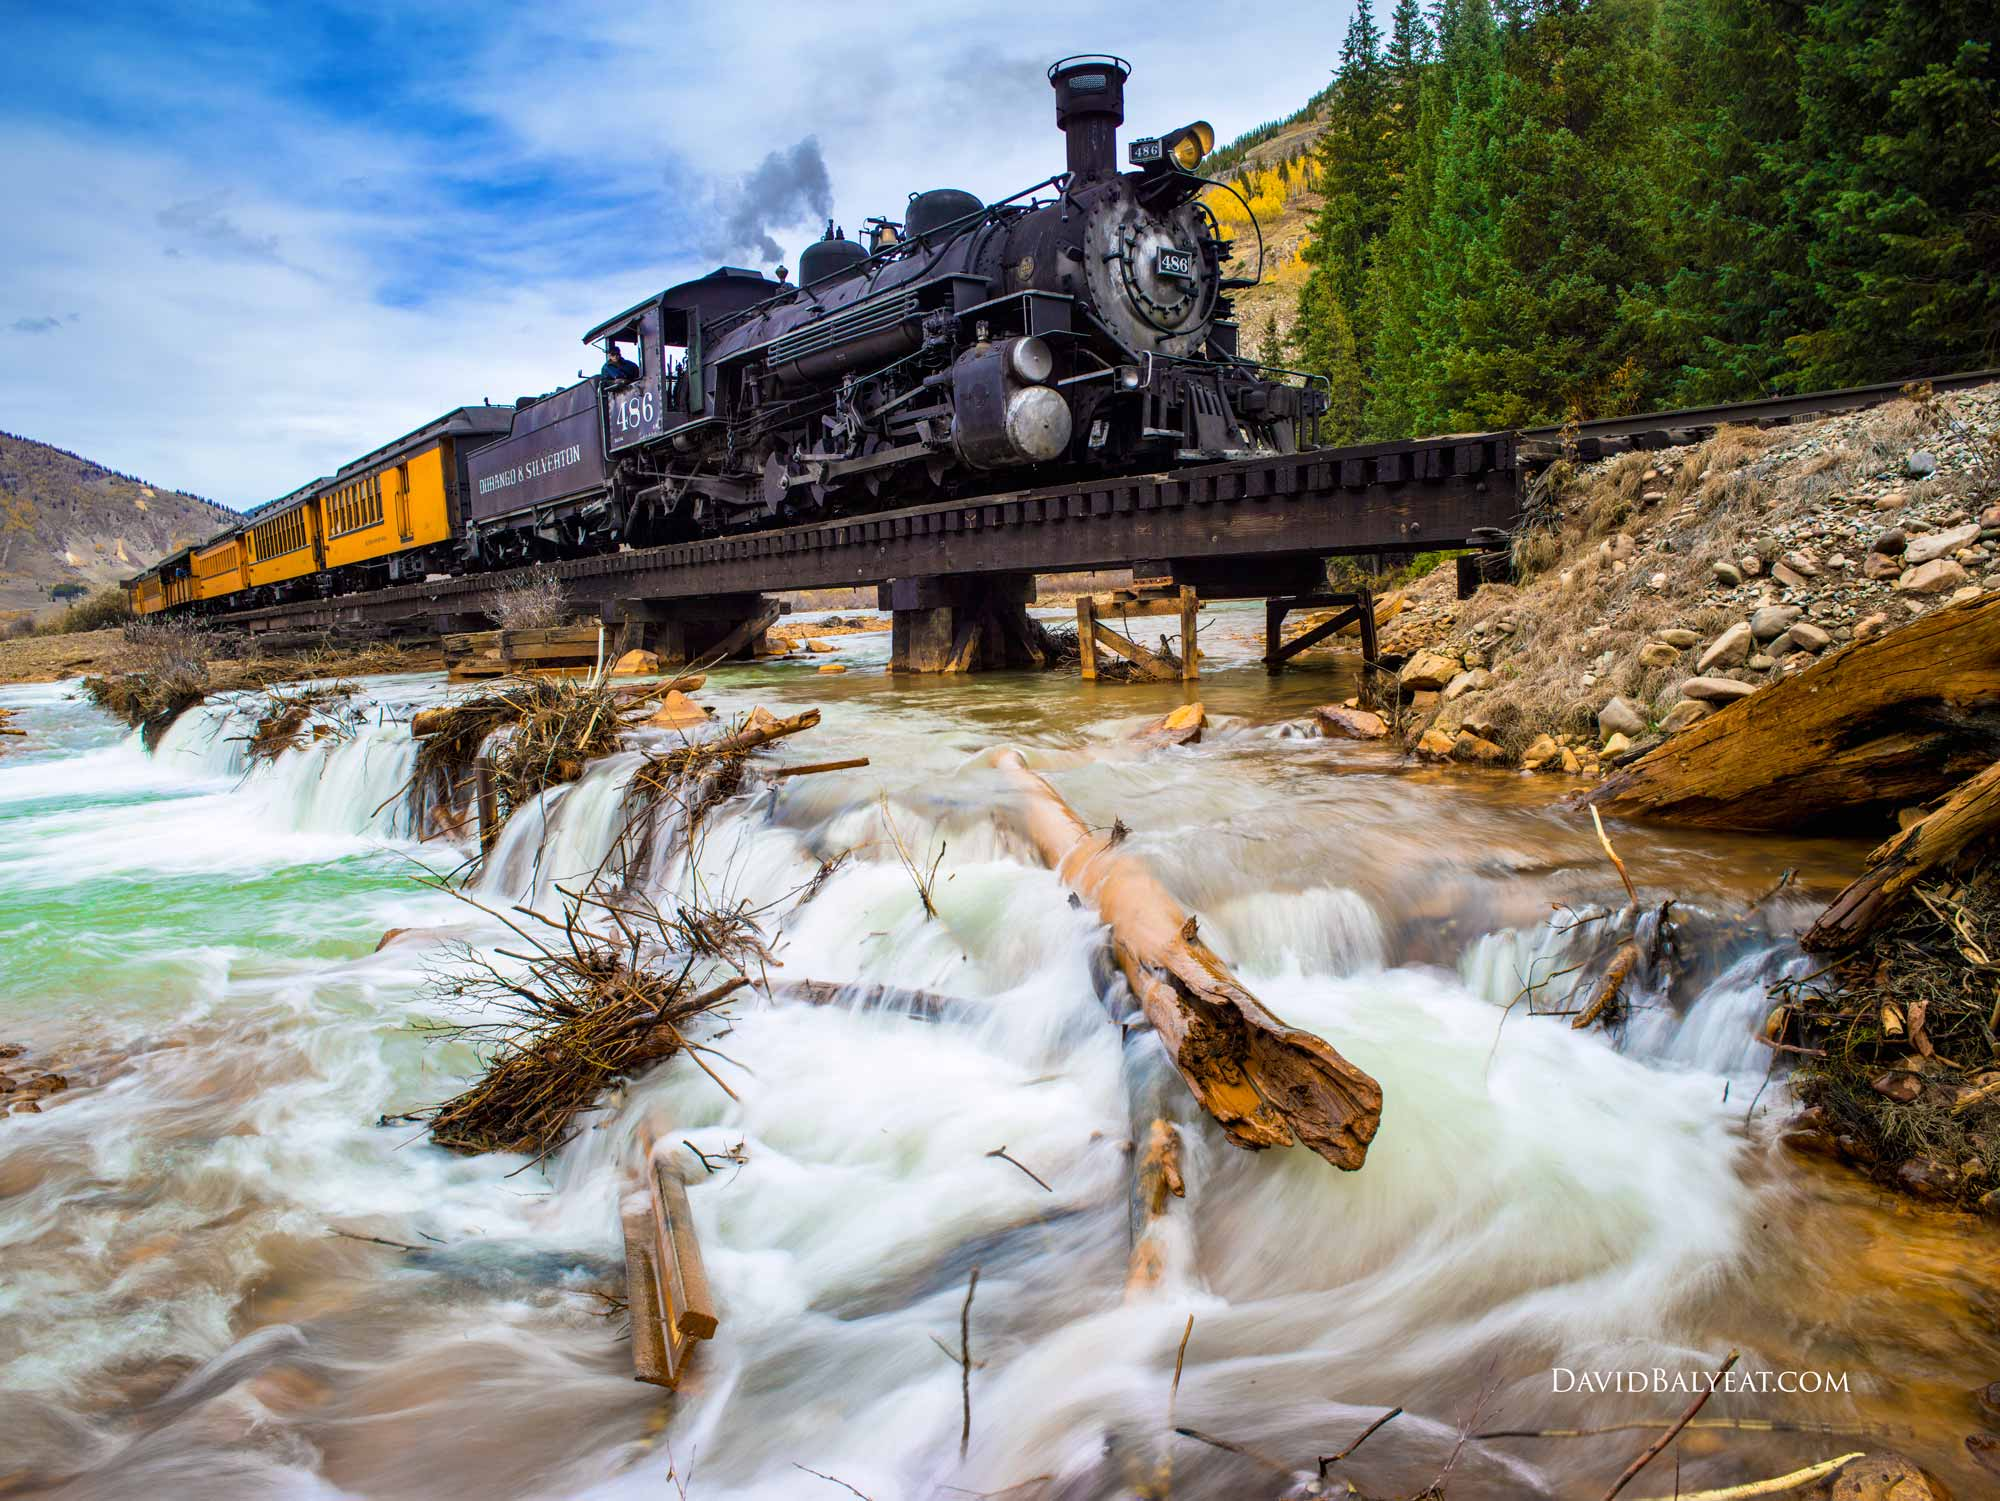 Train Silverton Durango Narrow Gauge Railroad Colorado high-definition HD professional landscape photography